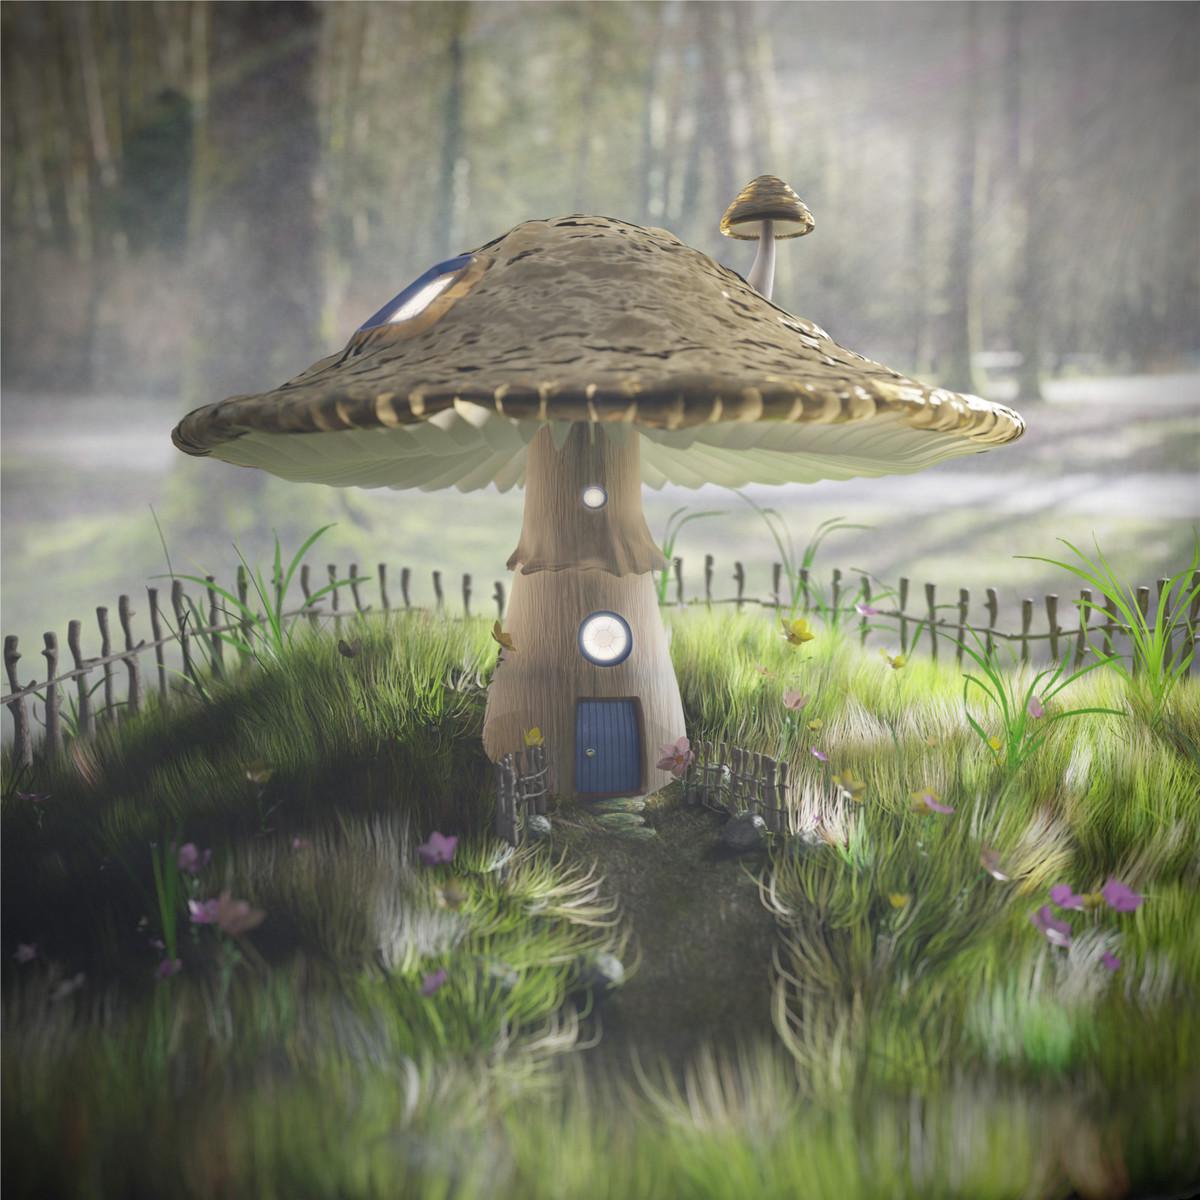 Fairy Tale Mushroom House in the Mist